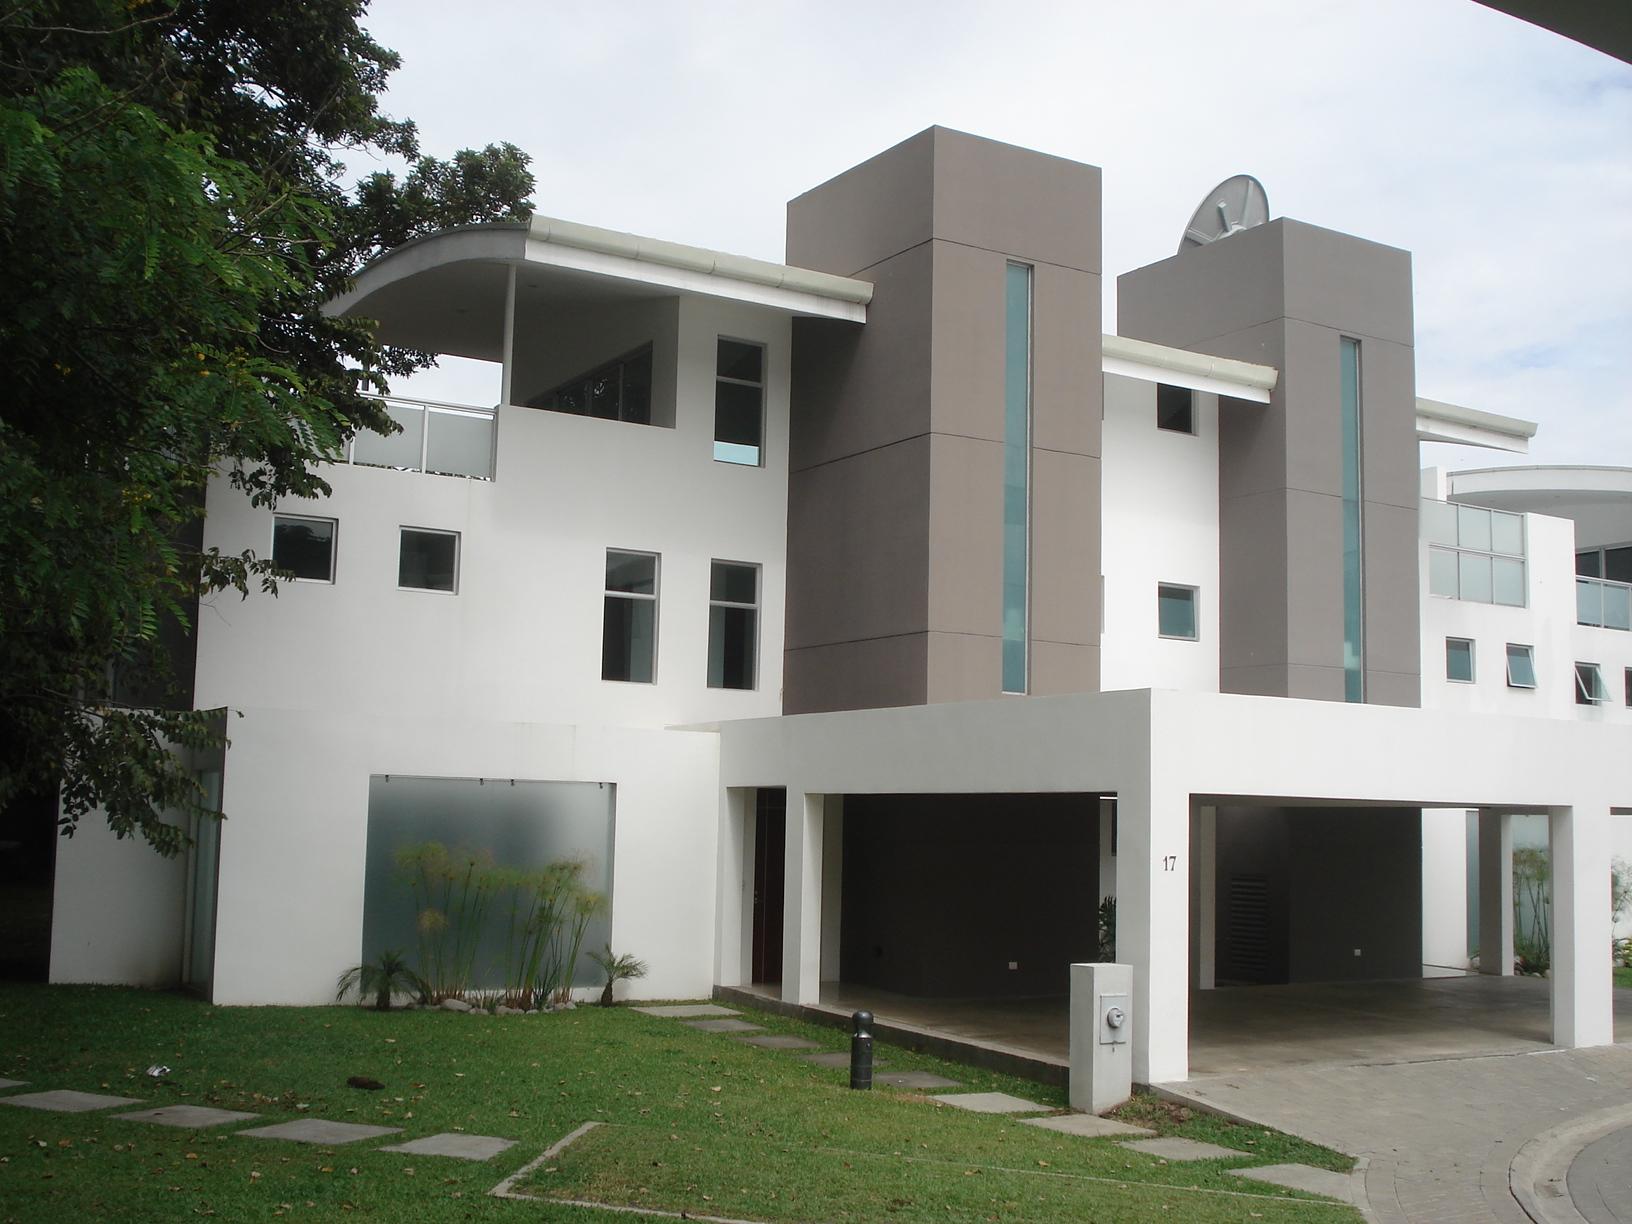 Nuvo casa 17 (2).JPG